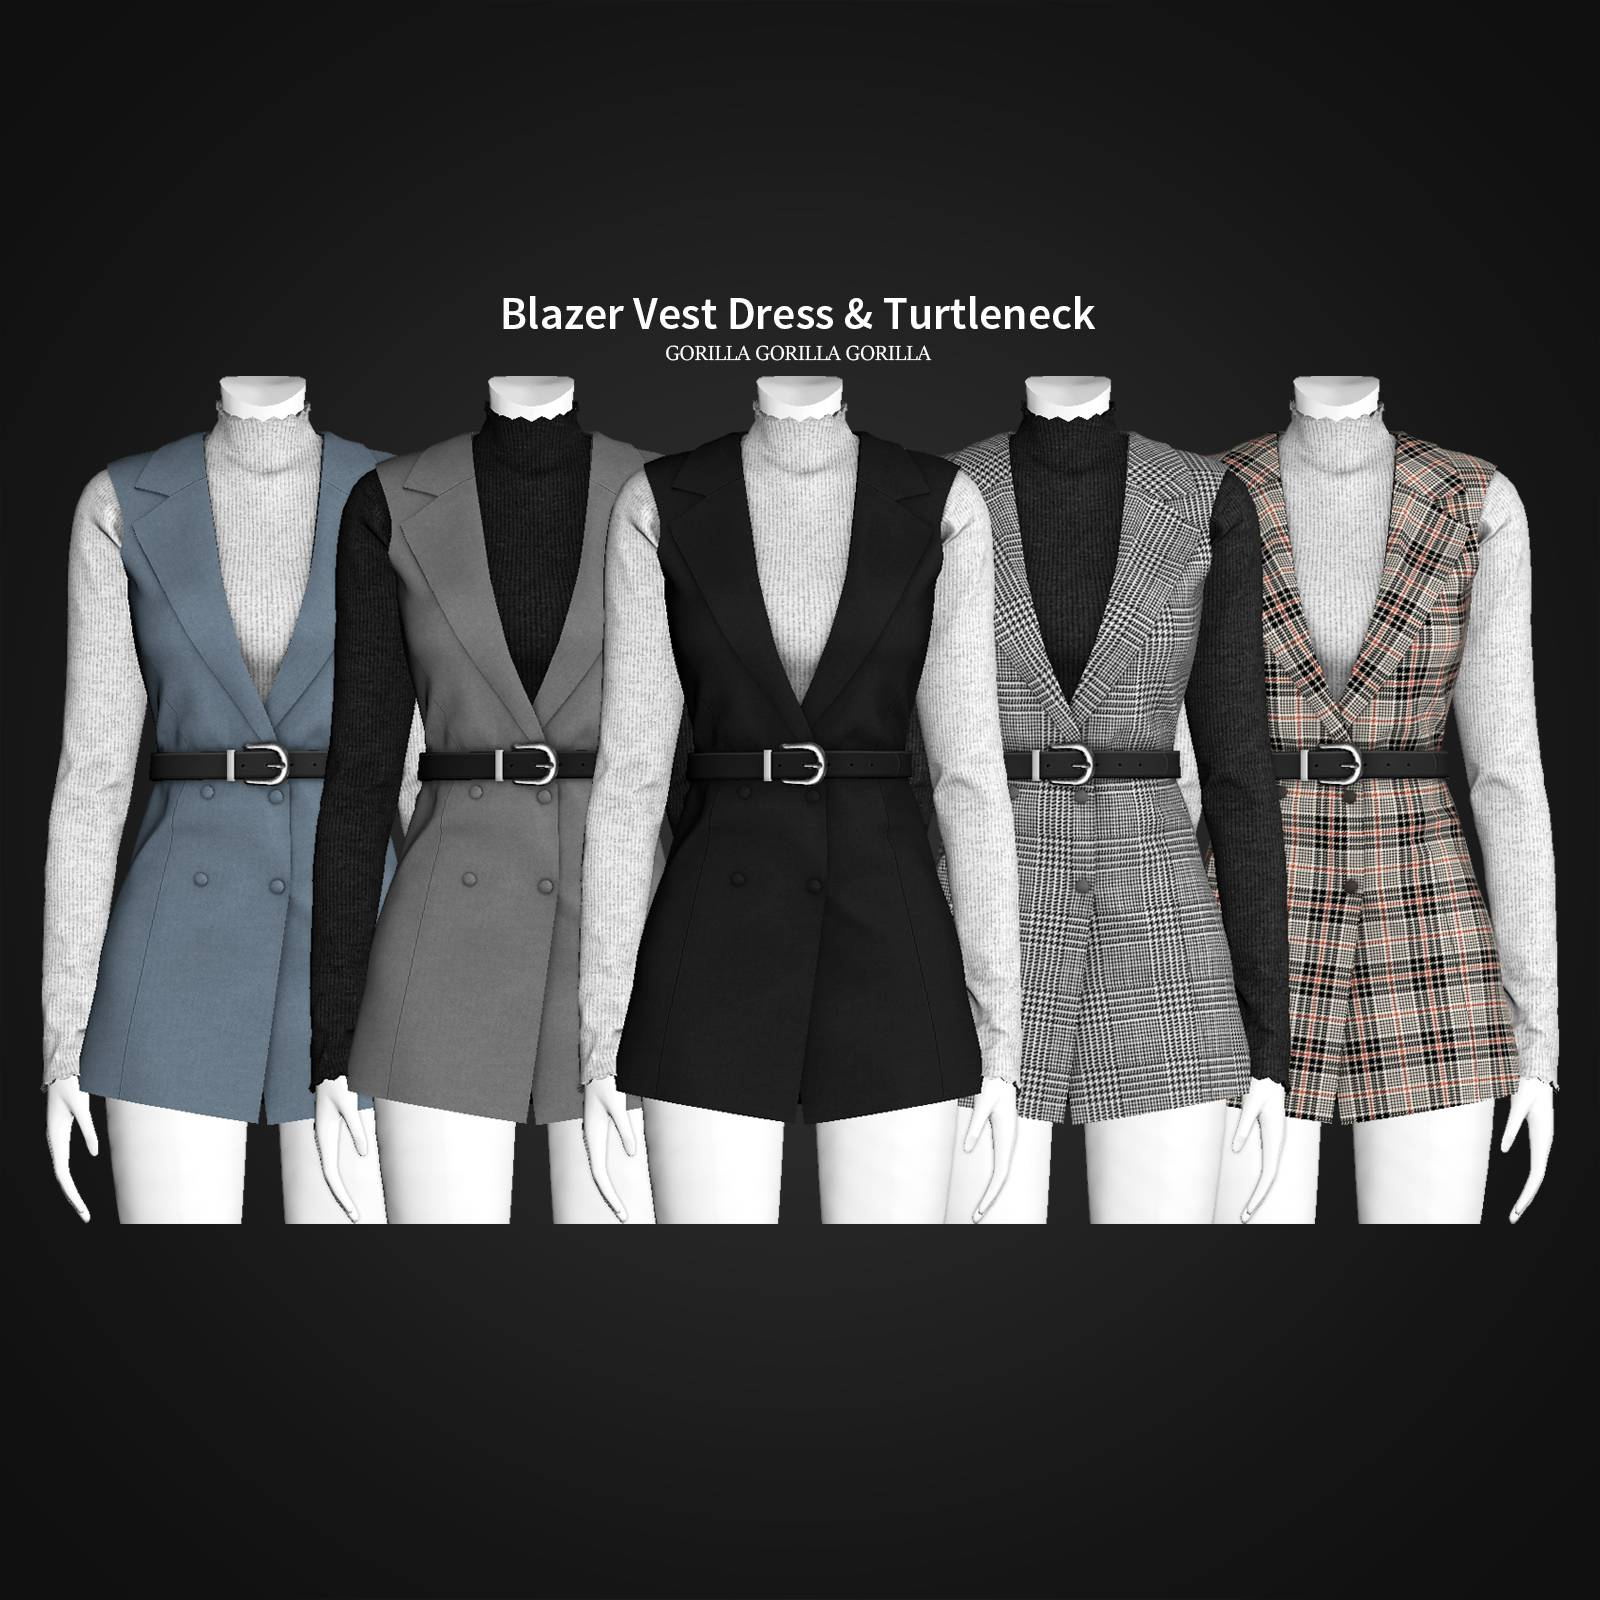 Жилет и водолазка - Blazer Vest Dress & Turtleneck